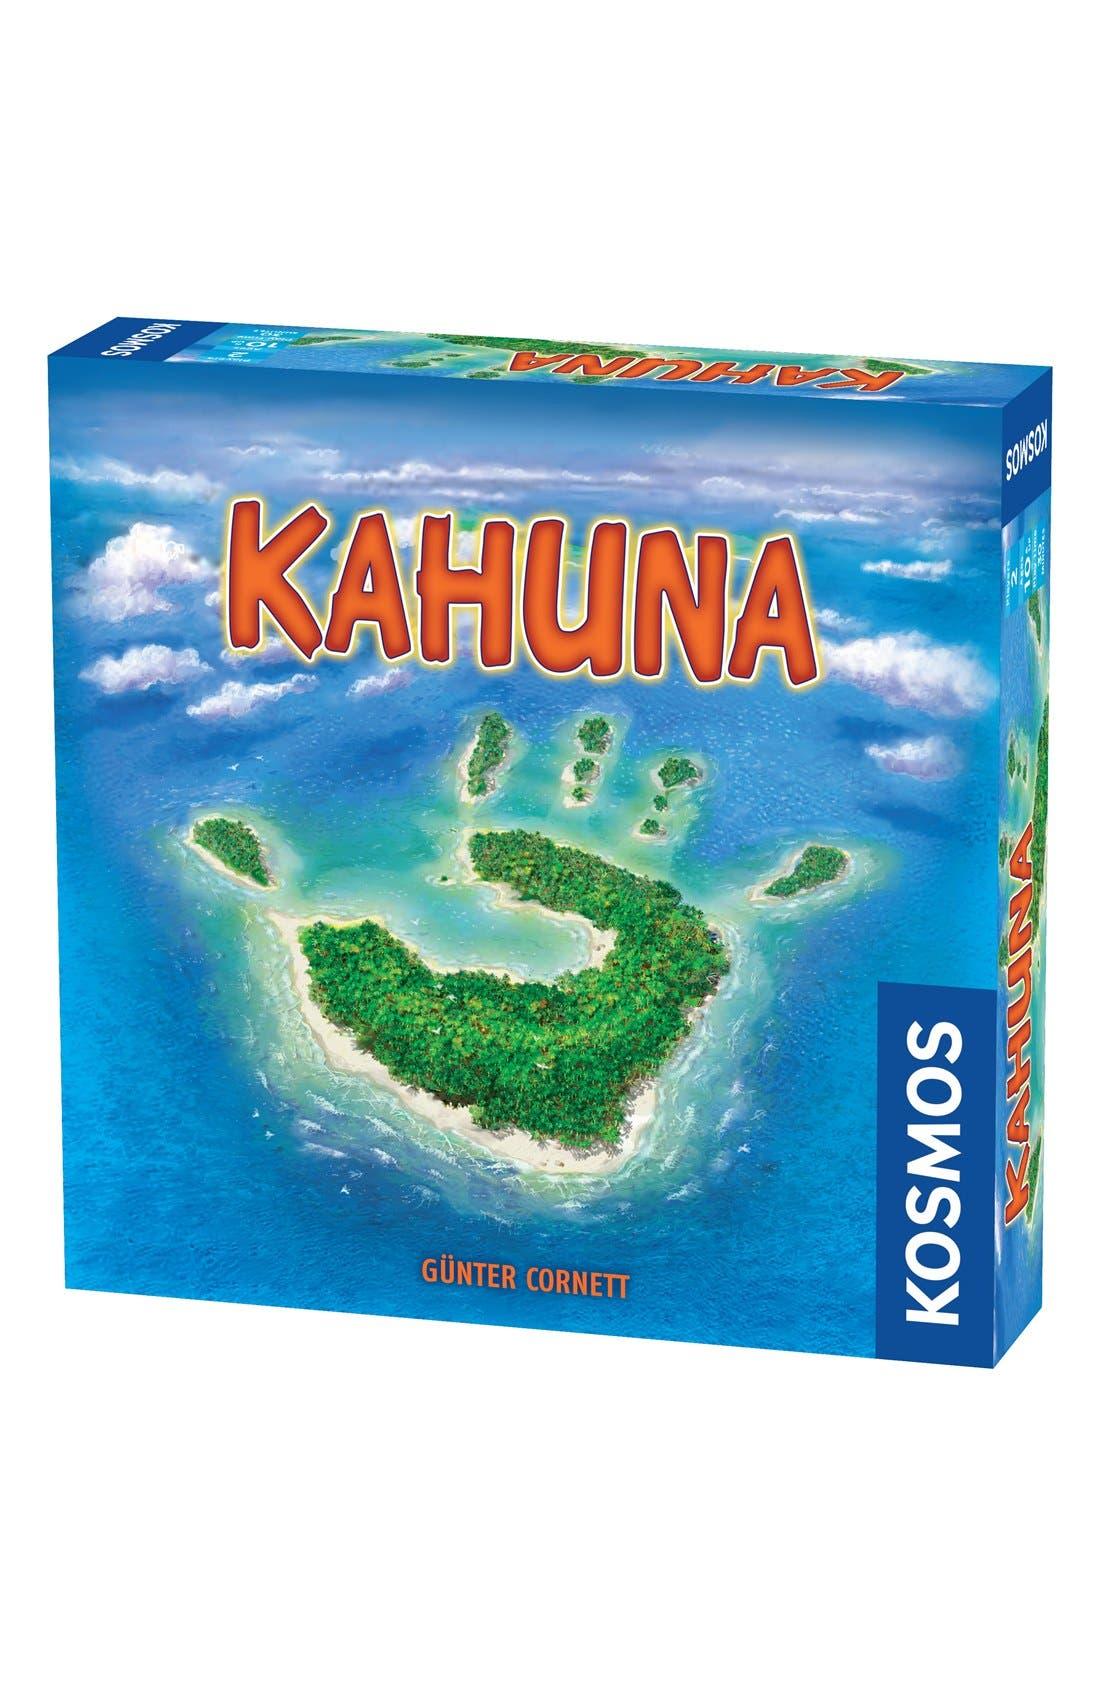 Thames & Kosmos 'Kahuna' Two-Player Board Game